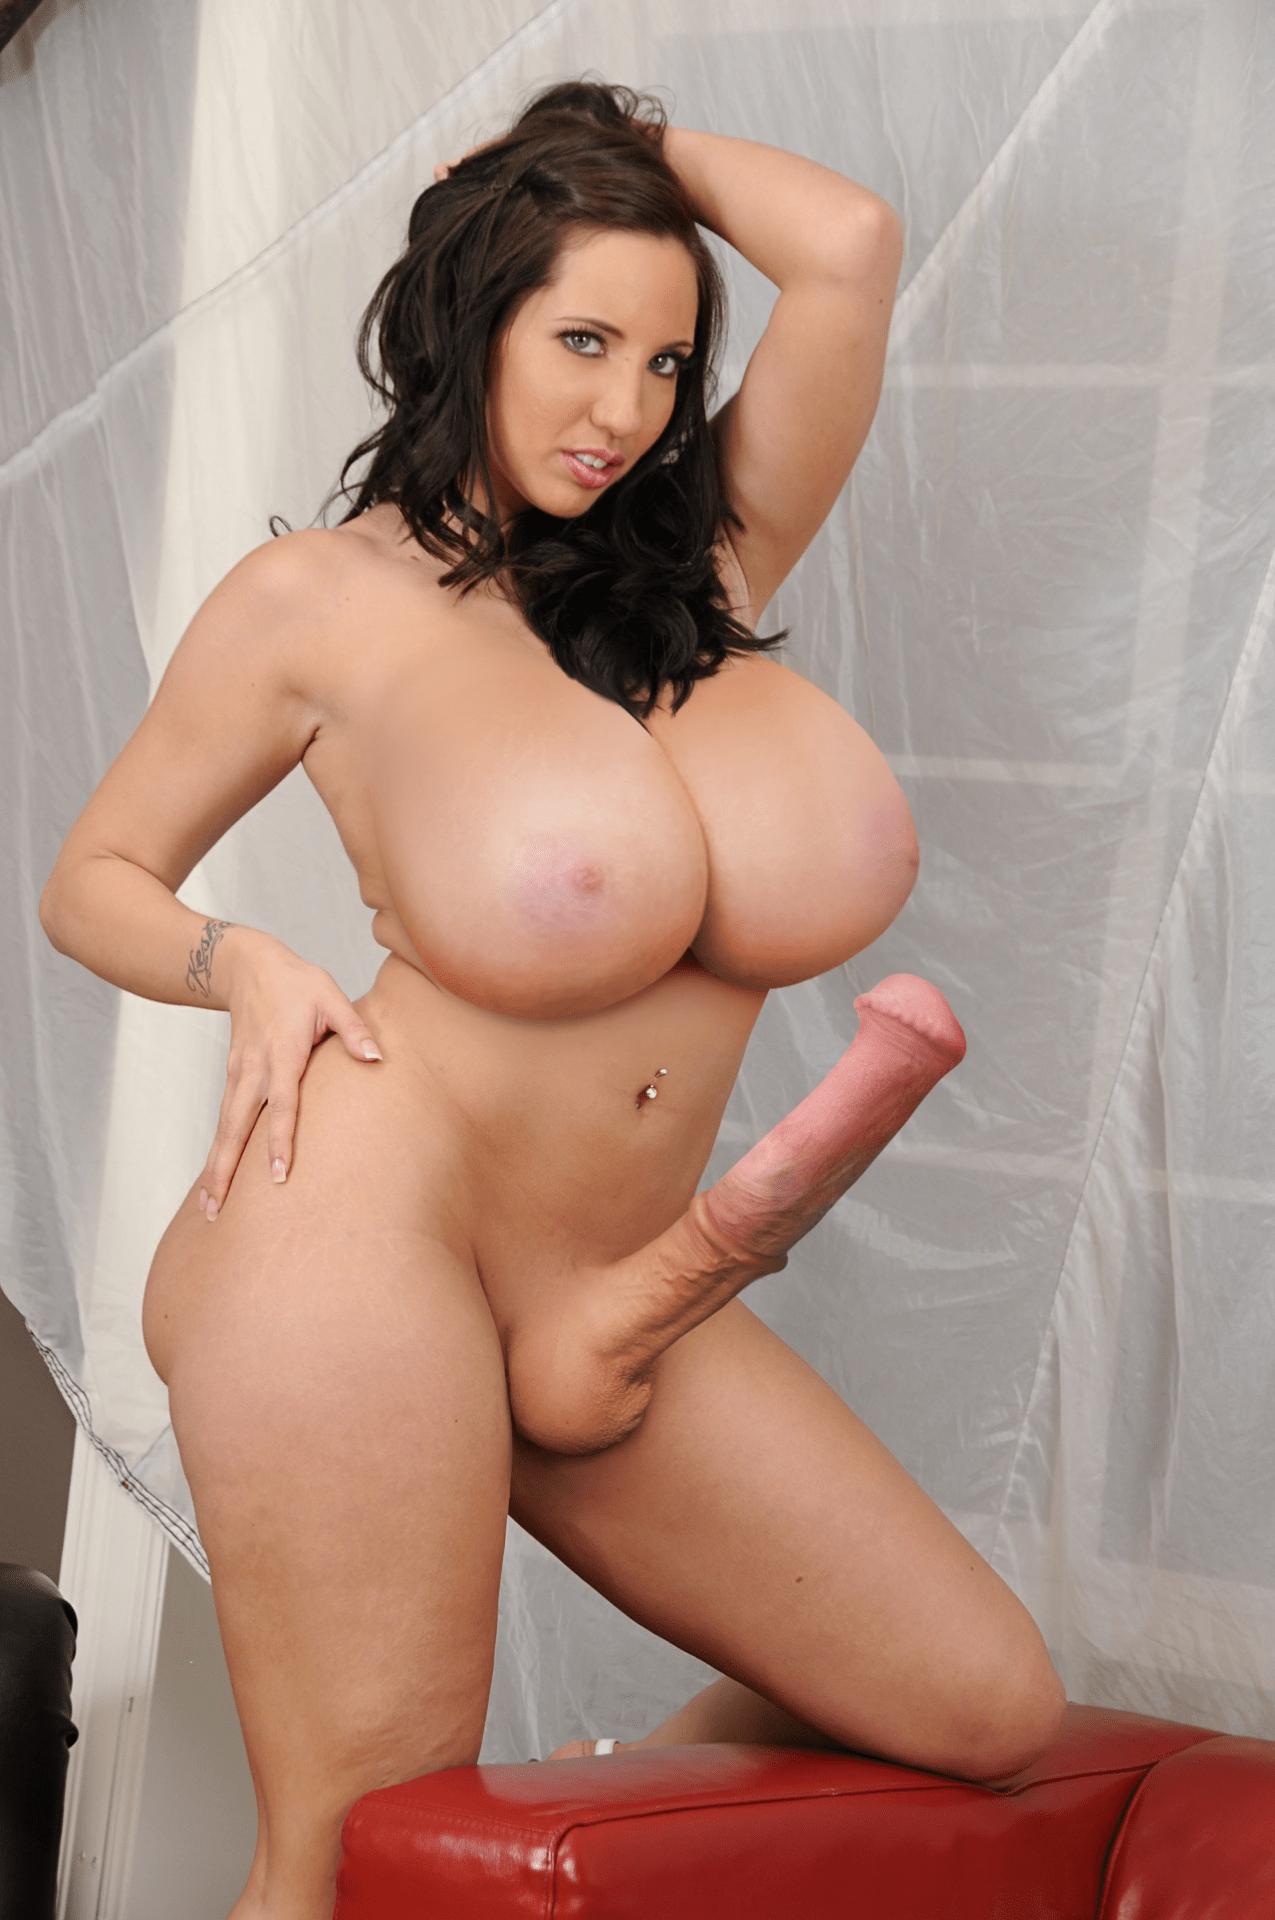 big dicks big tits tumblr